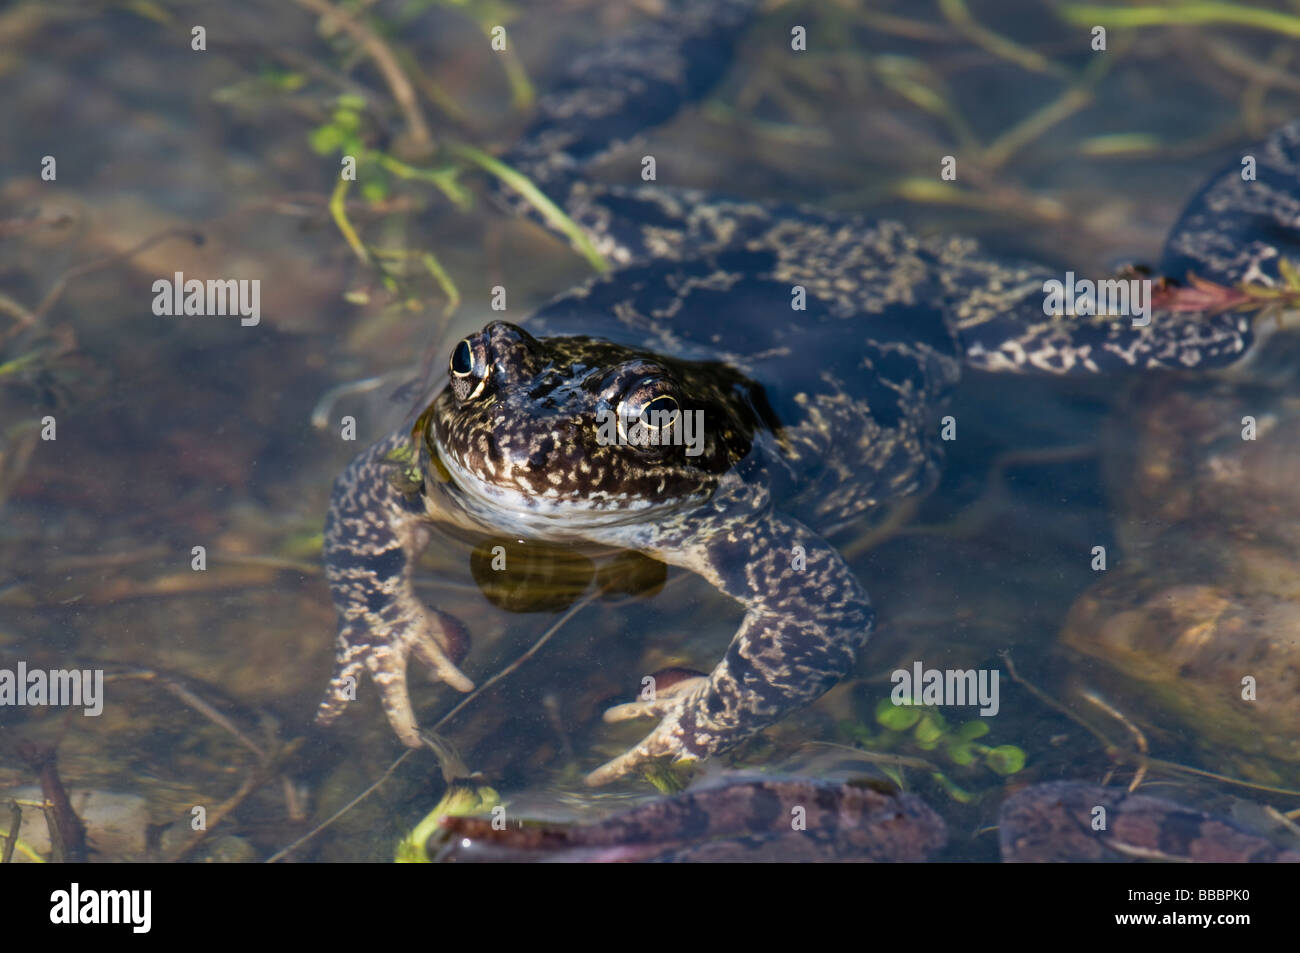 Common Frog (Rana temporaria) among spawn - Stock Image